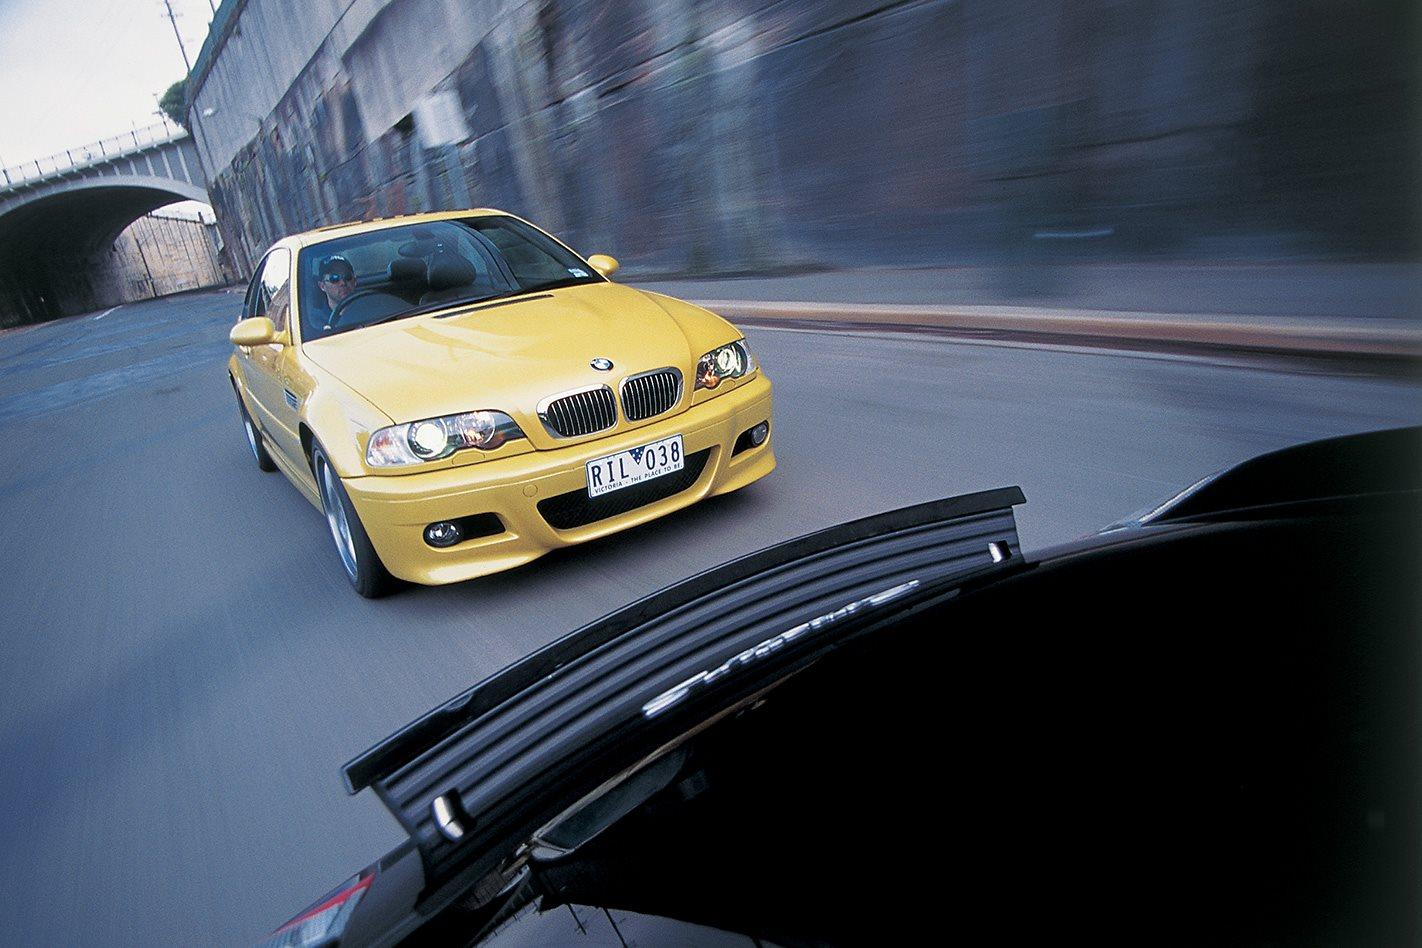 2003 BMW M3 drive